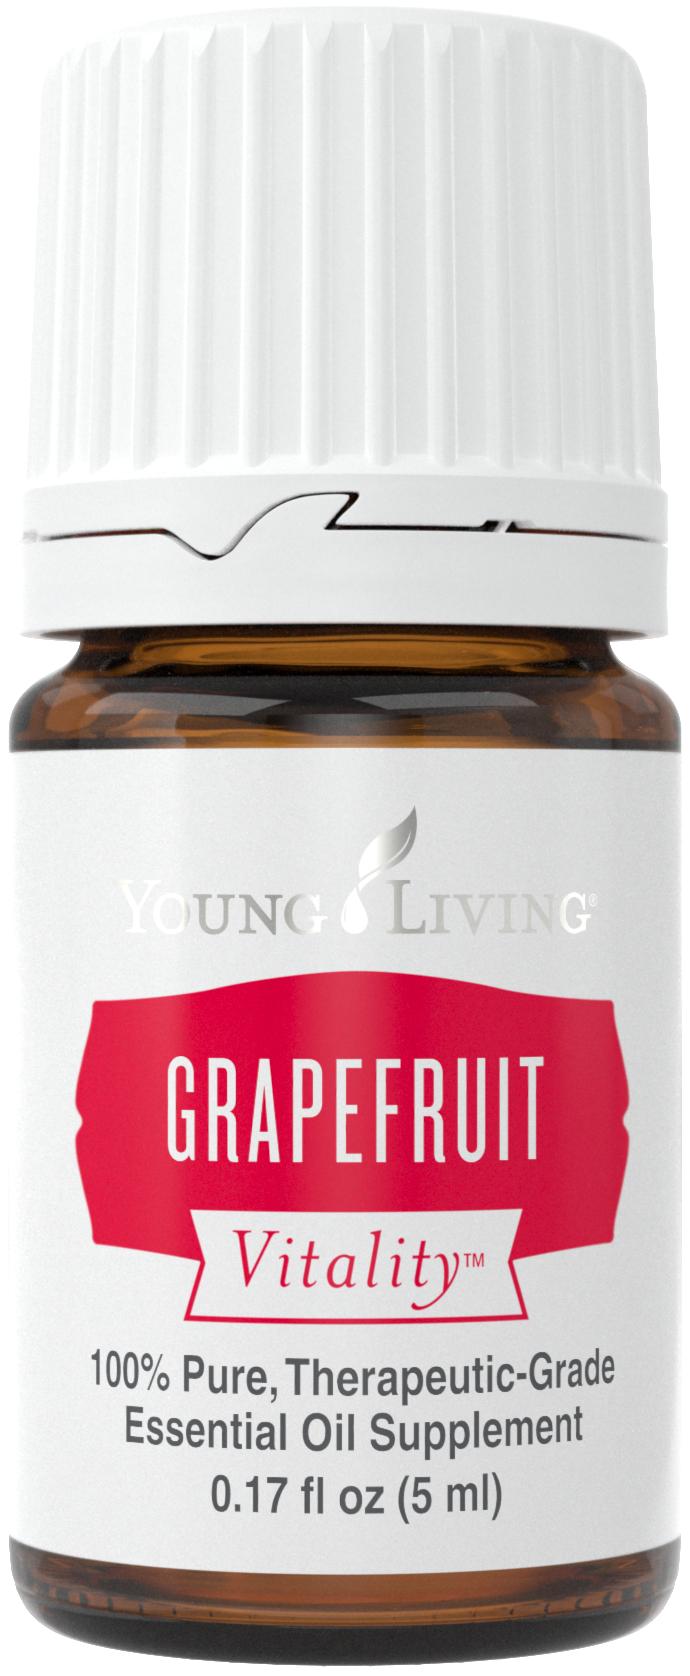 grapefruit_5ml_suplement_silo_2016_23774247944_o